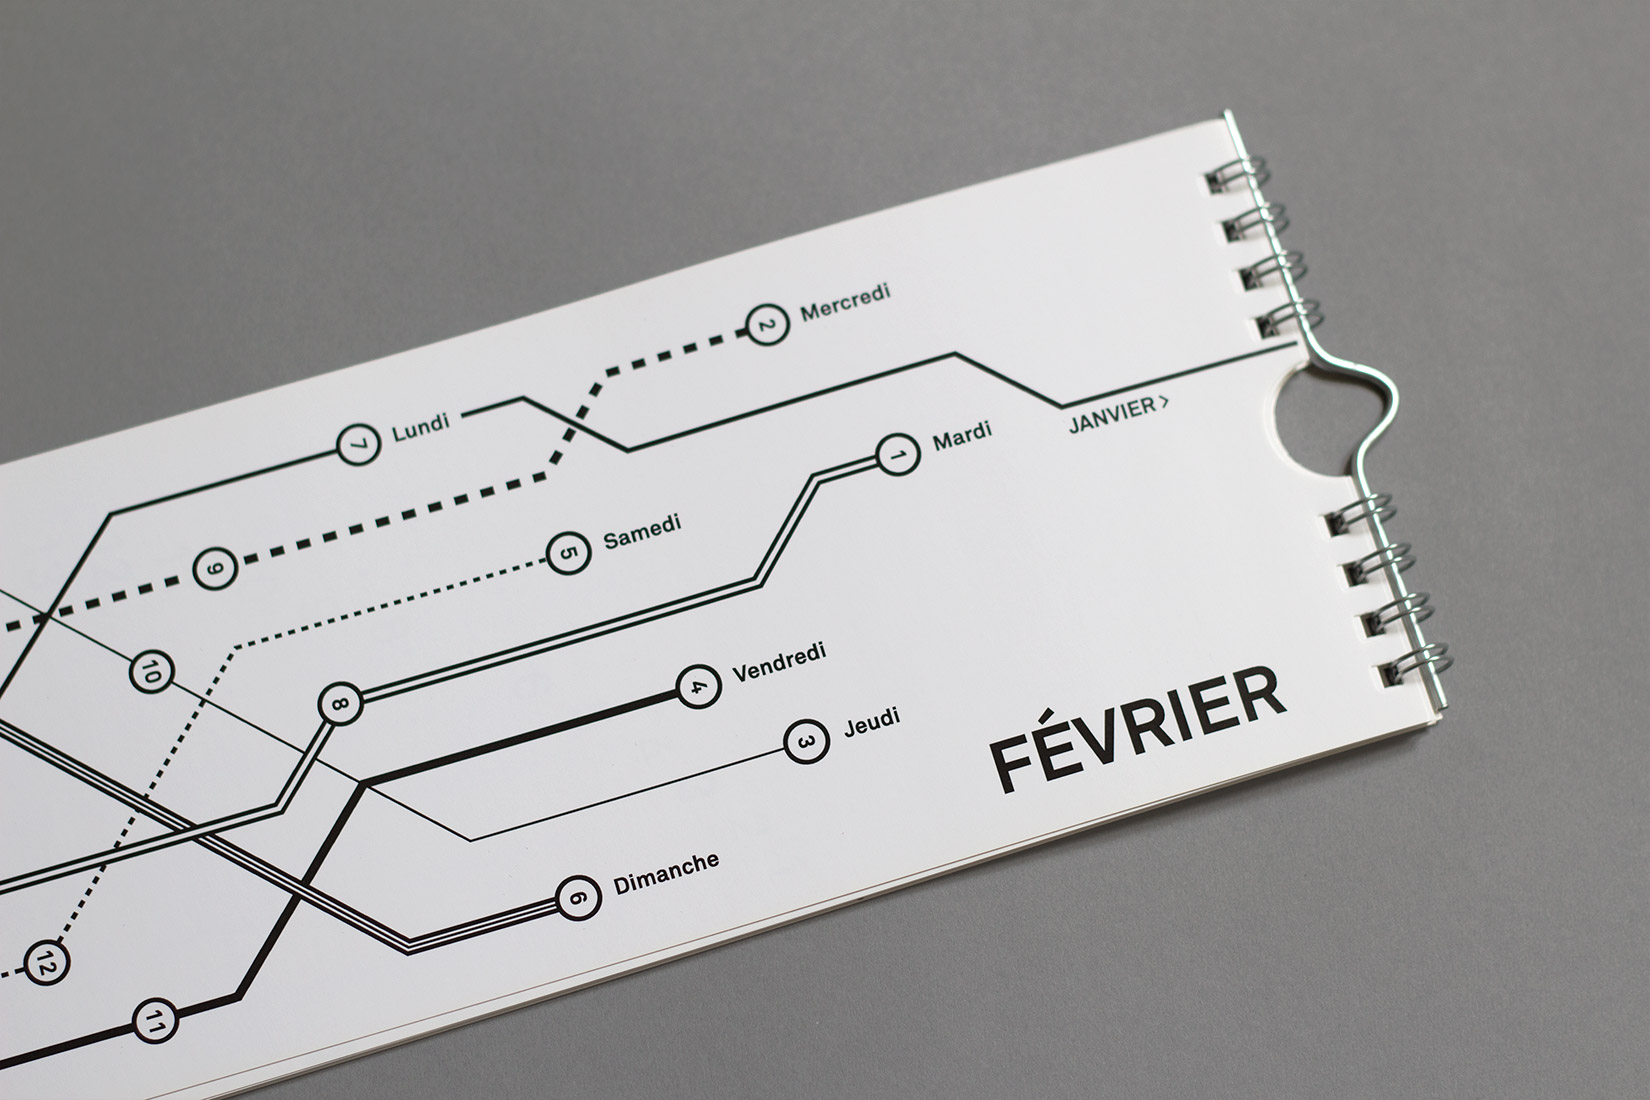 Calendar Typography Map : Typographic calendar yan vuillème